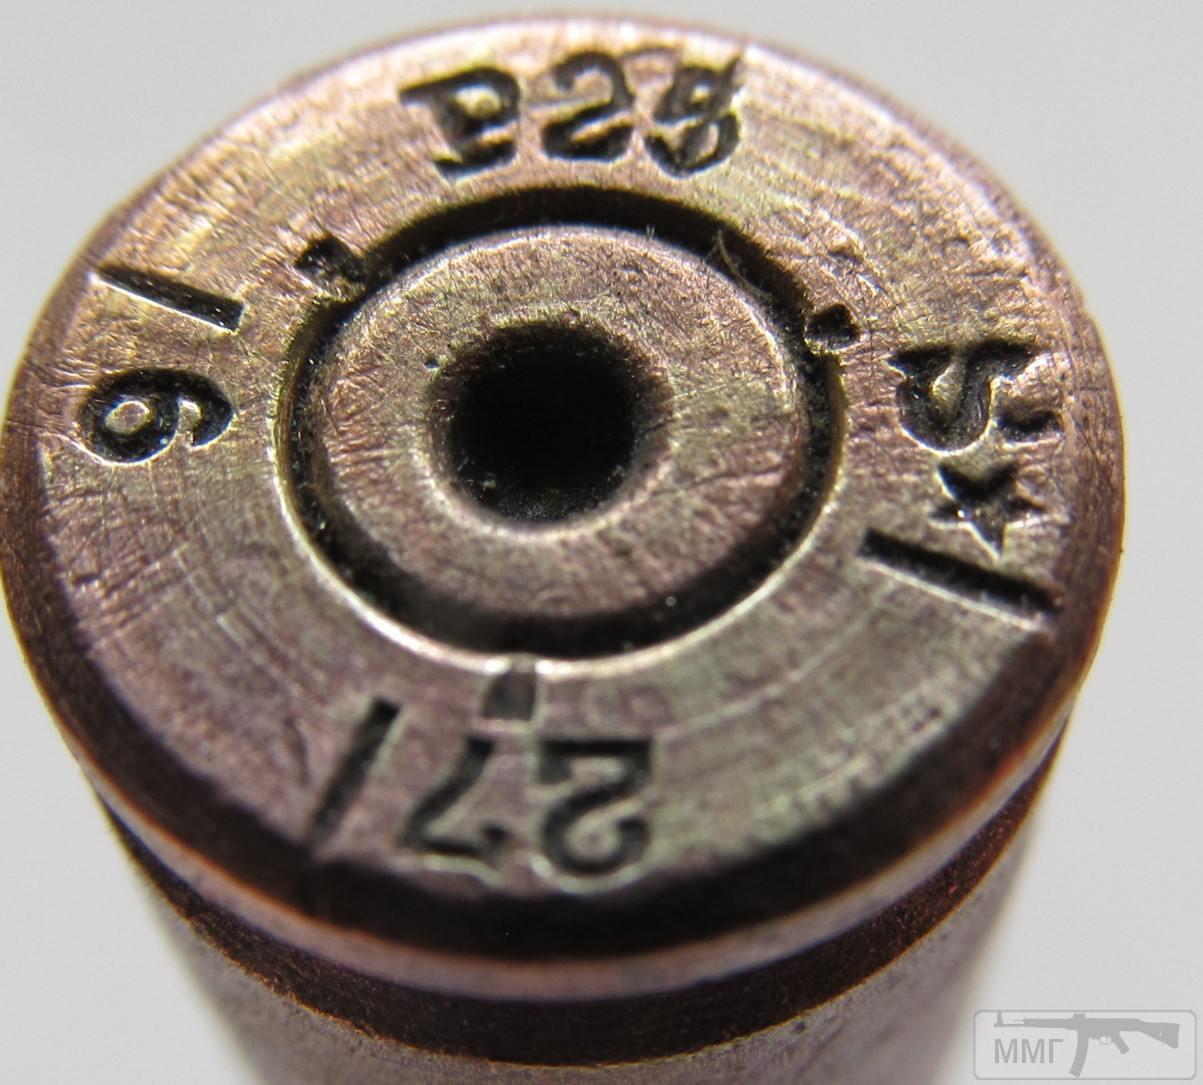 100387 - Патрон 7,92x57 «Маузер» - виды, маркировка, история